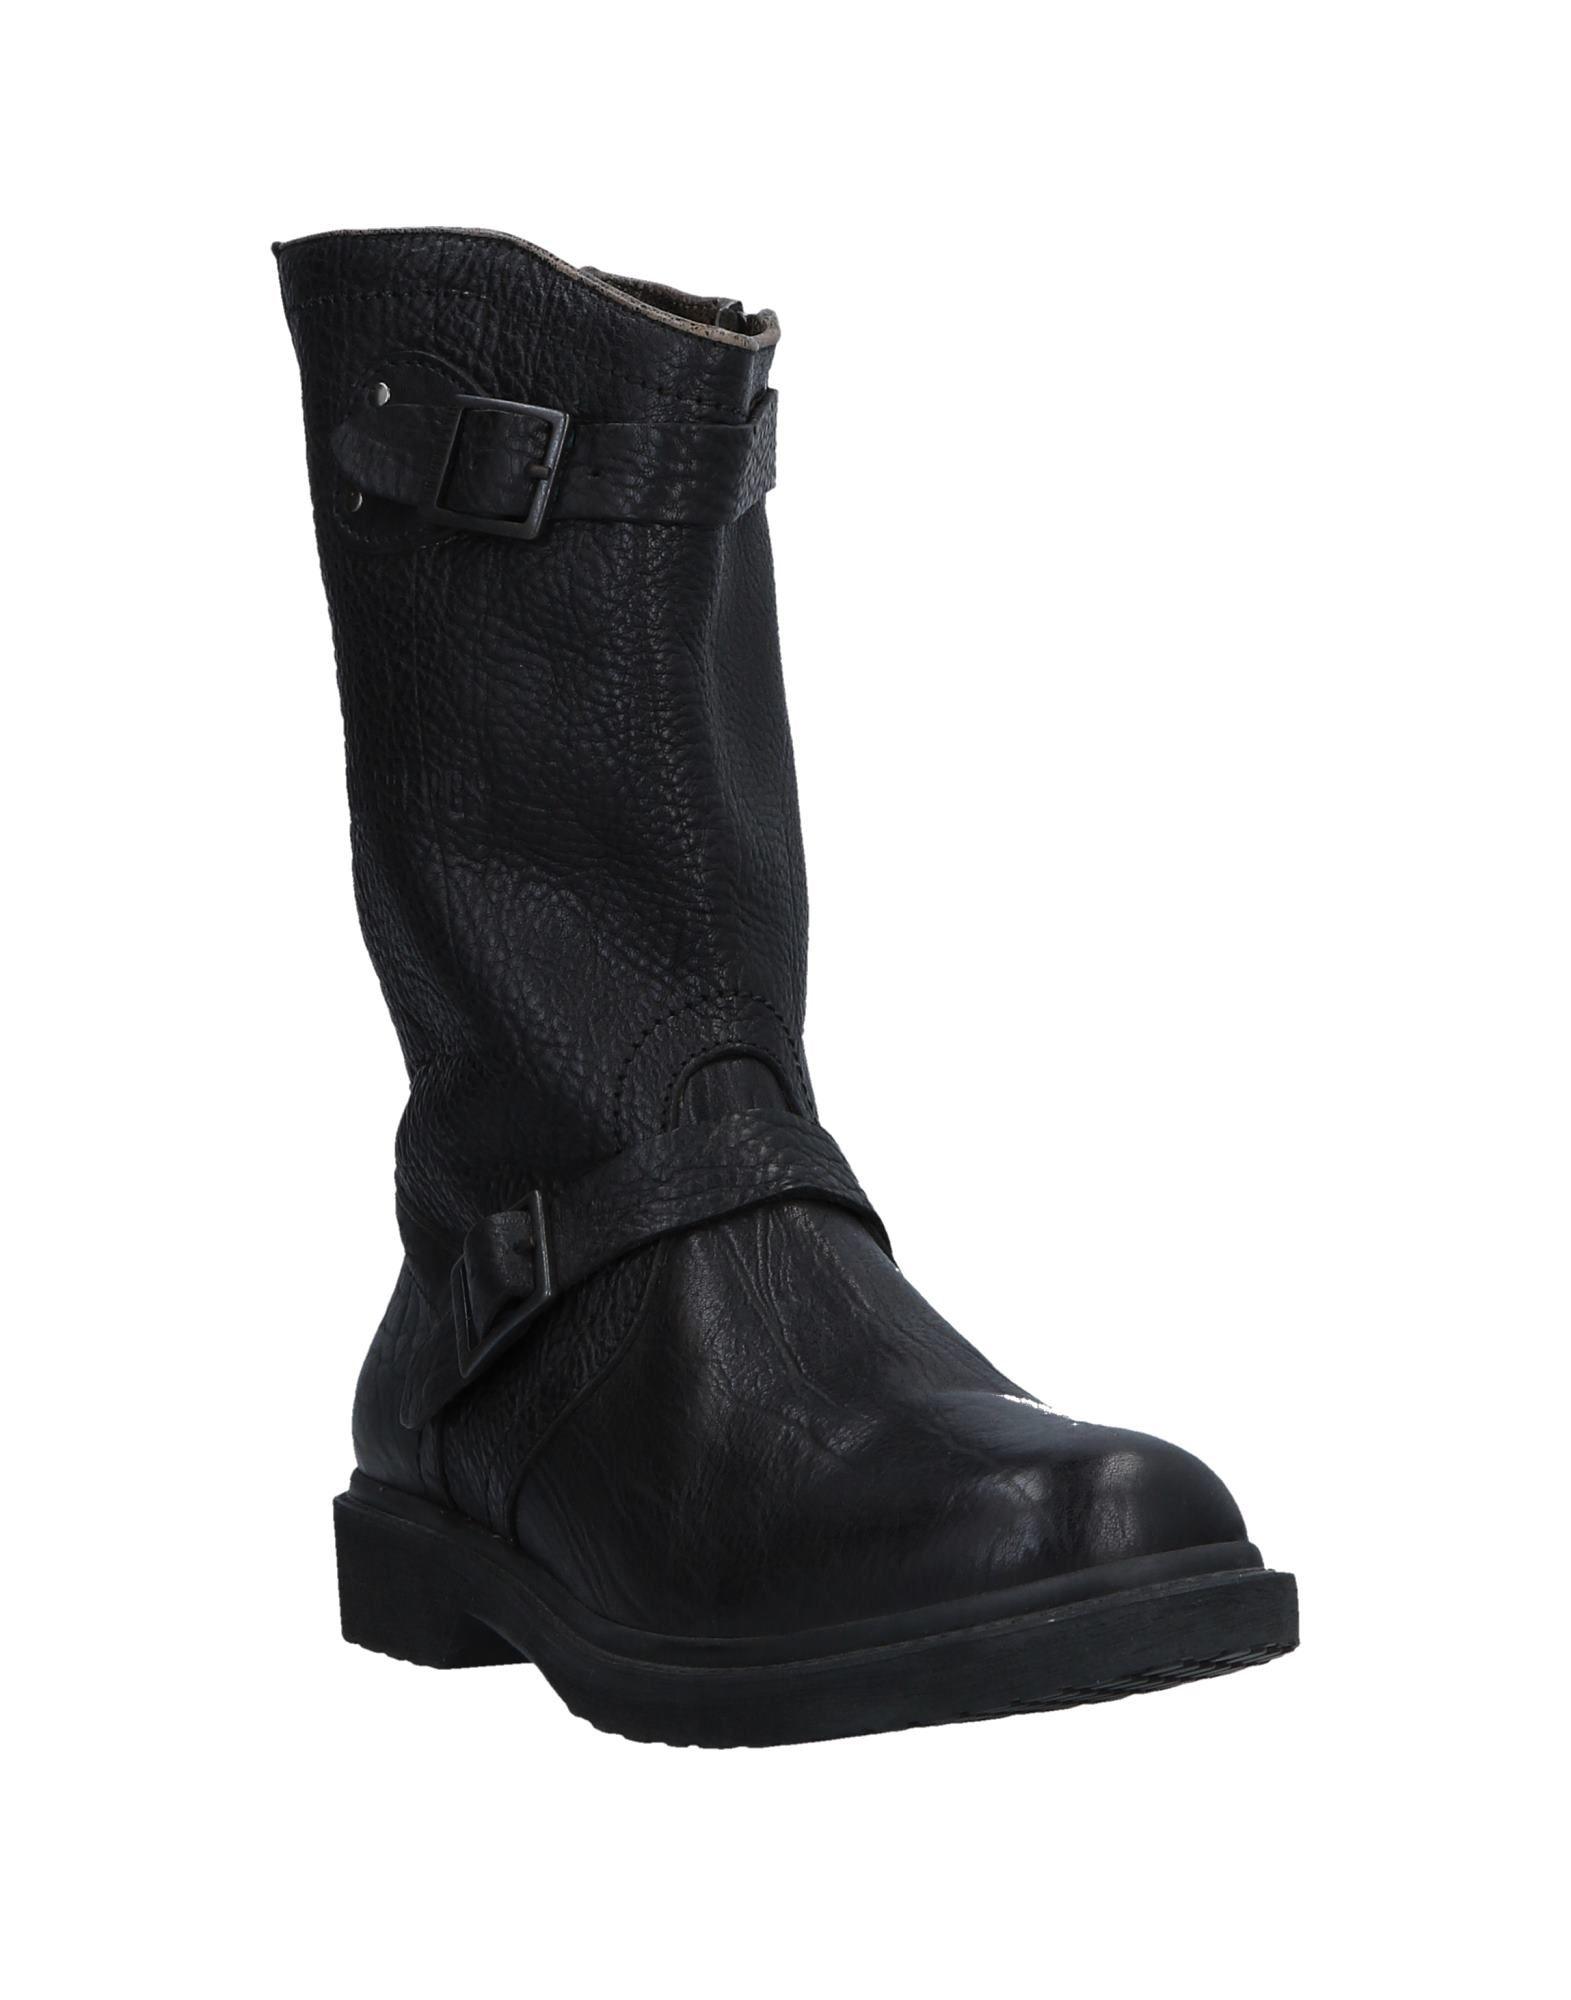 Bikkembergs 11522036TS Stiefelette Herren  11522036TS Bikkembergs Gute Qualität beliebte Schuhe 70b8ad